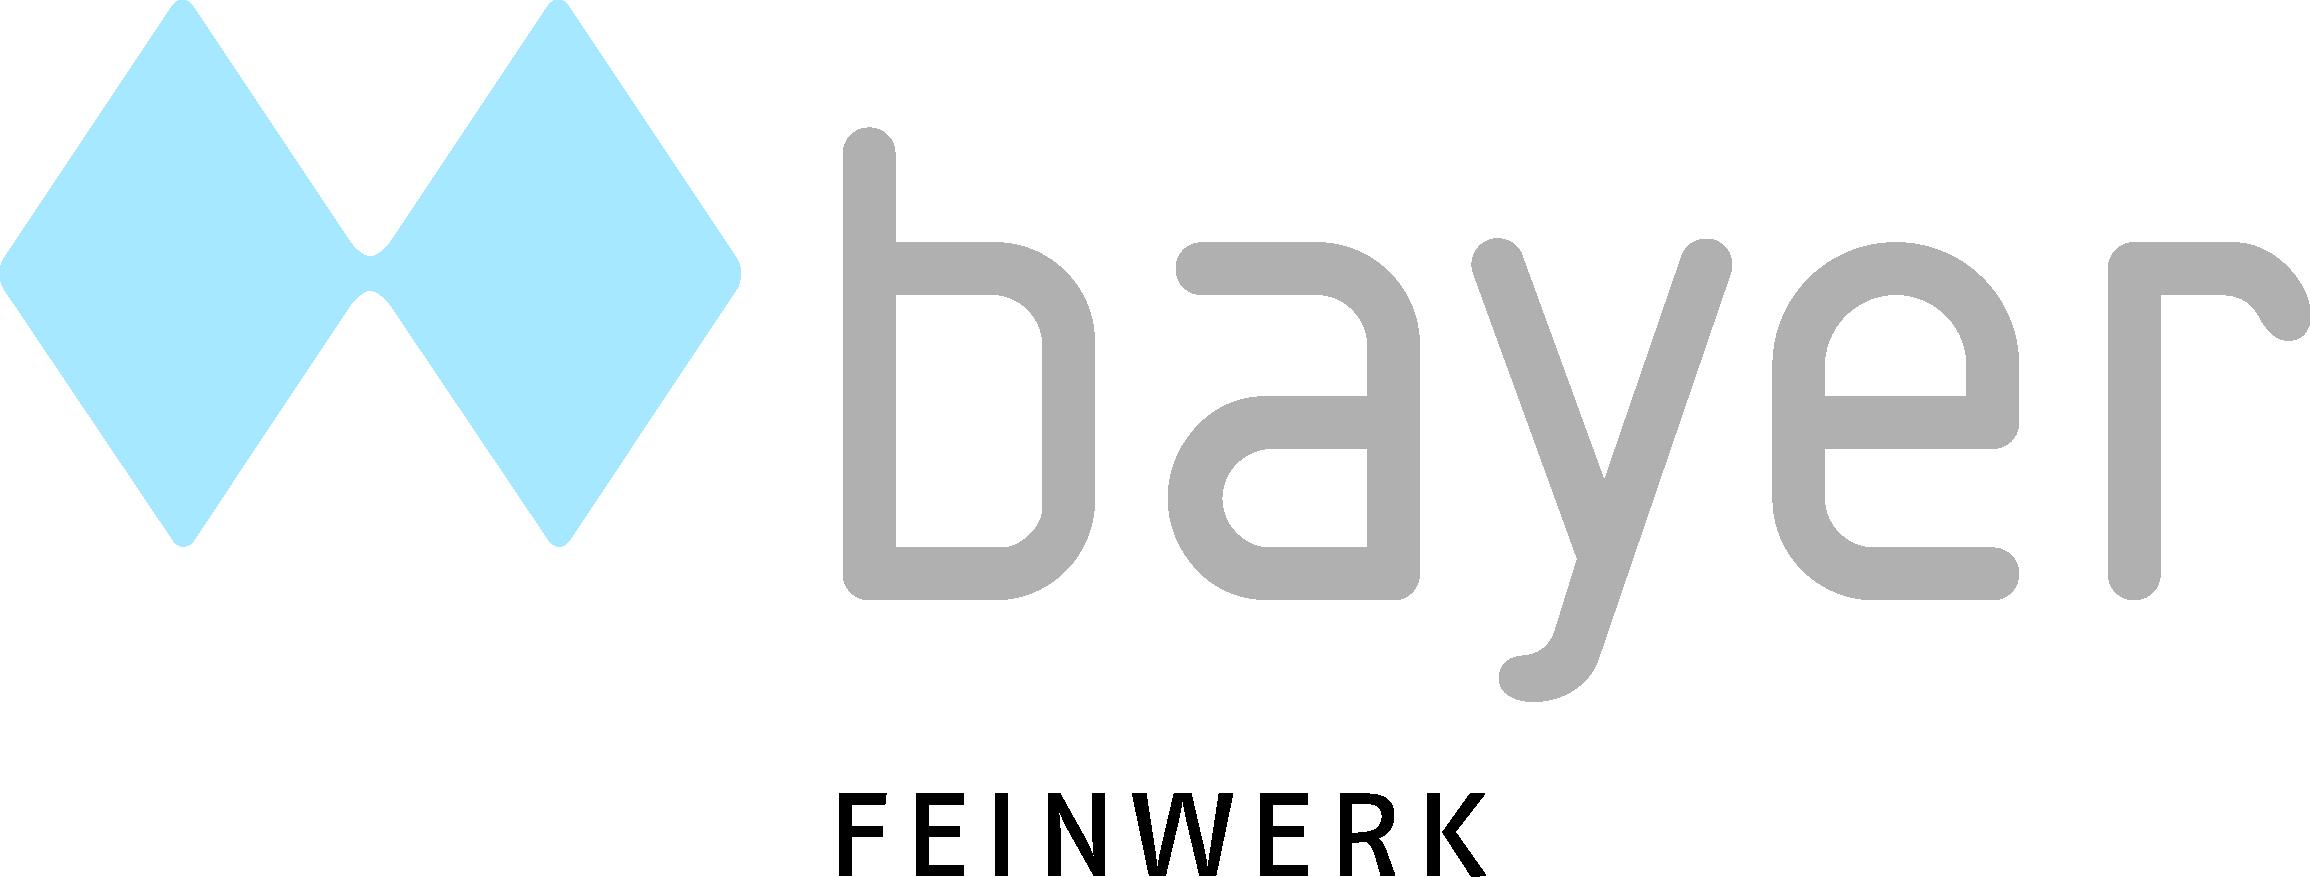 BAYER_LOGO_4c.jpg